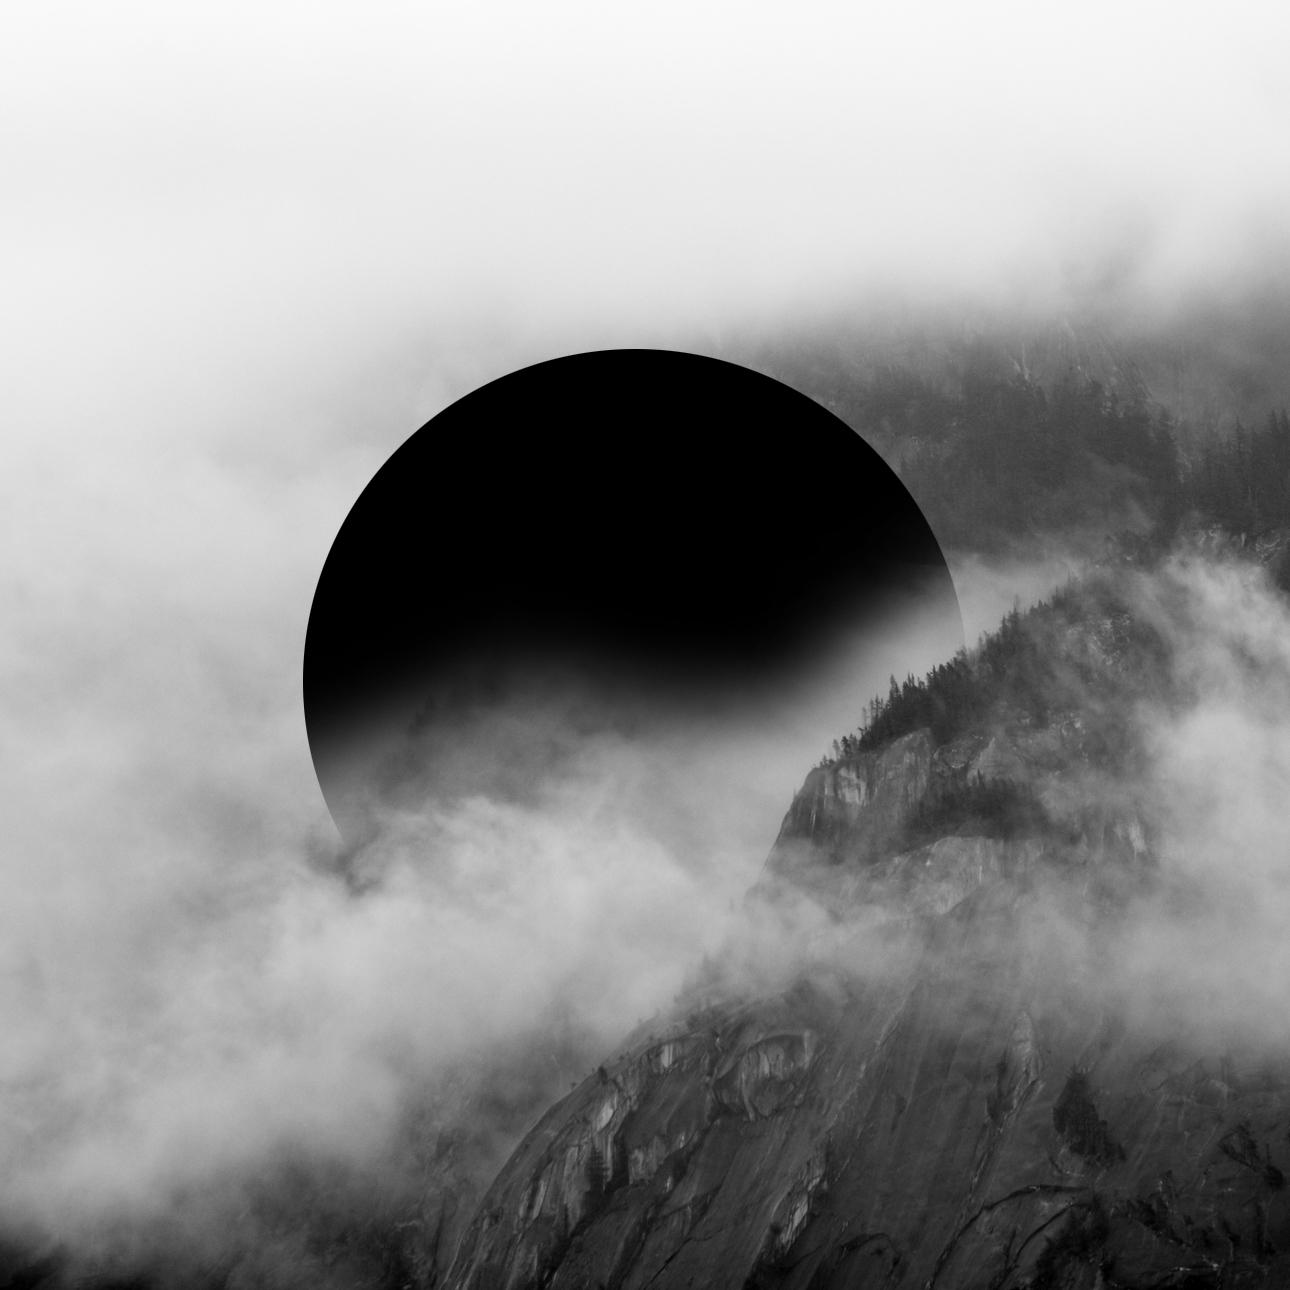 feels circles - dominikkalita | ello